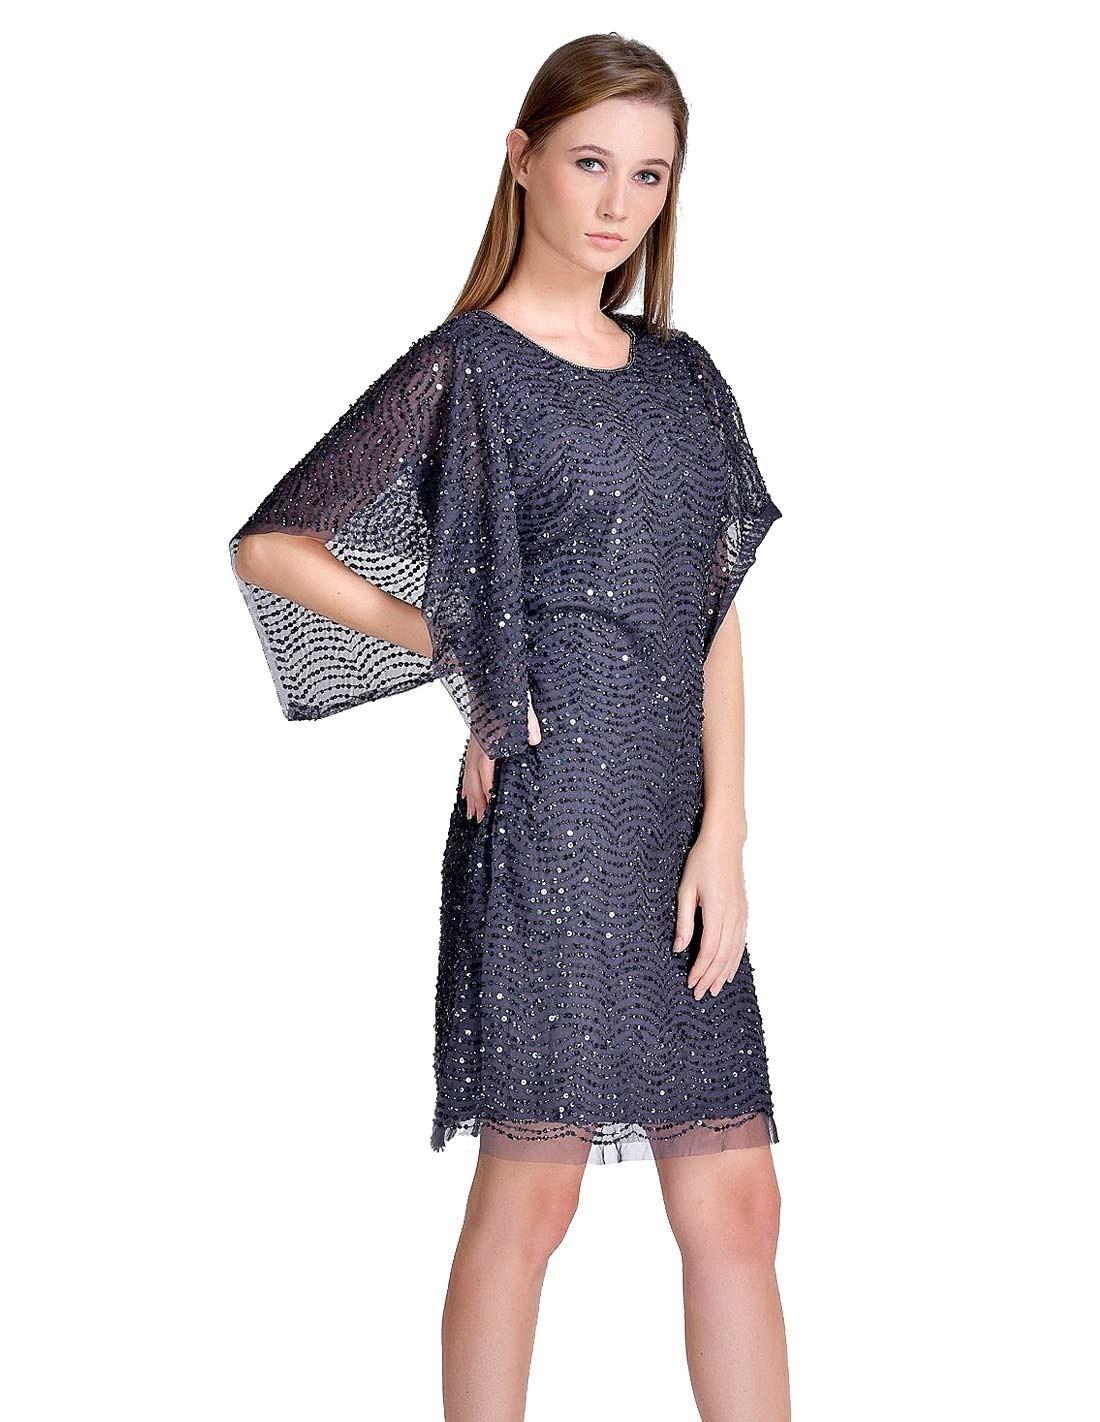 Vestido De Fiesta Gris Oscuro Con Manga Capa Y Lentejuelas Talla Ropa S Colores Plata